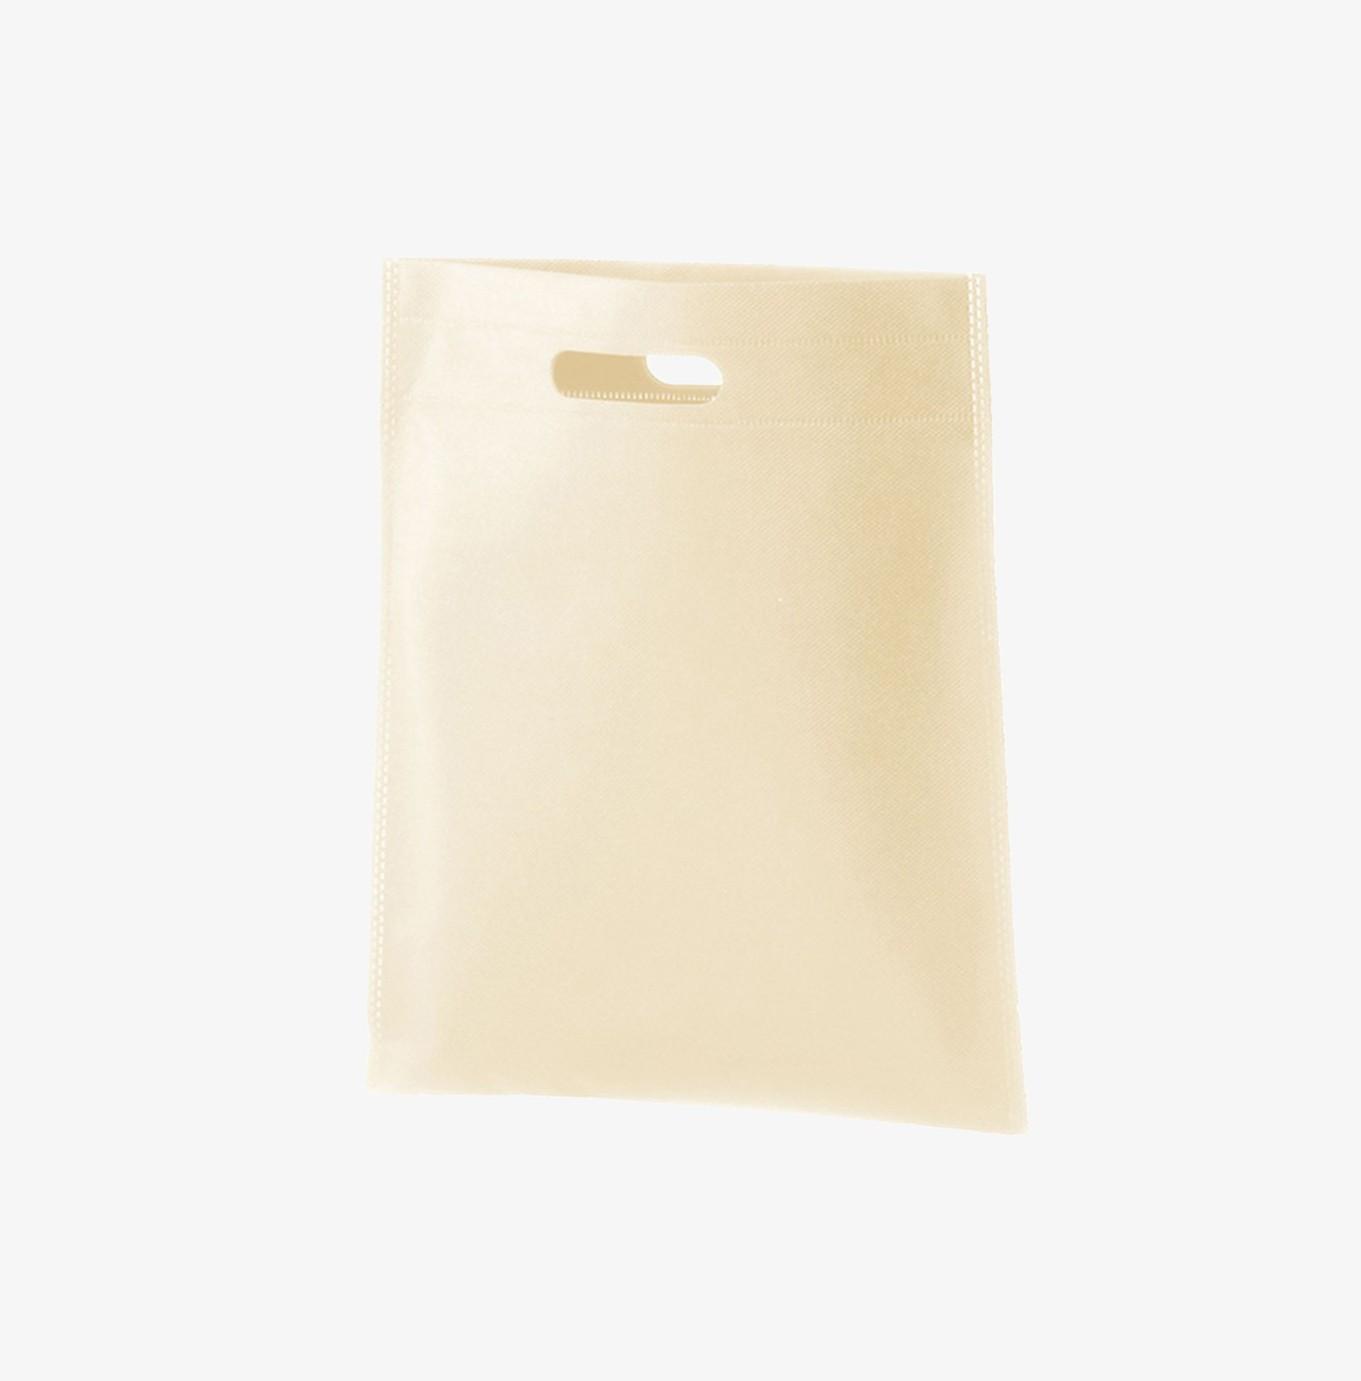 PKD23x35MB 米白色平口袋 23x35cm